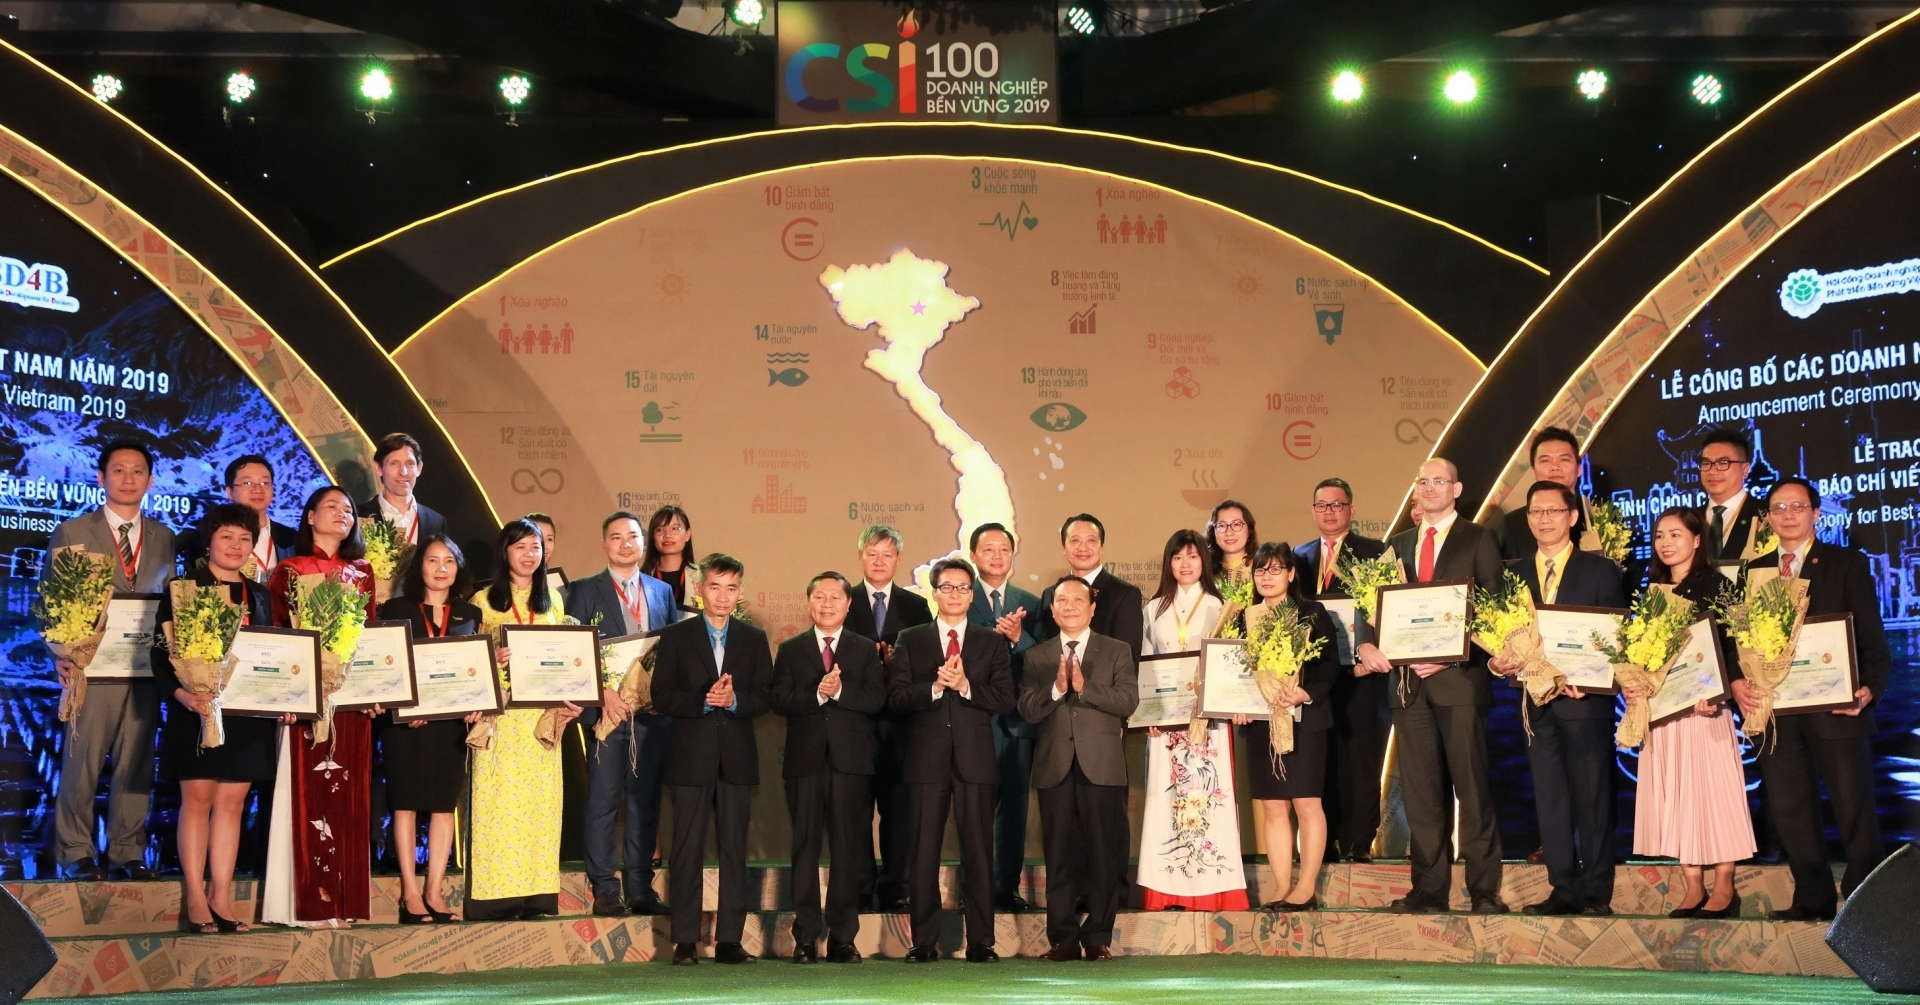 hdbank duoc vinh danh top 10 doanh nghiep ben vung nam 2019